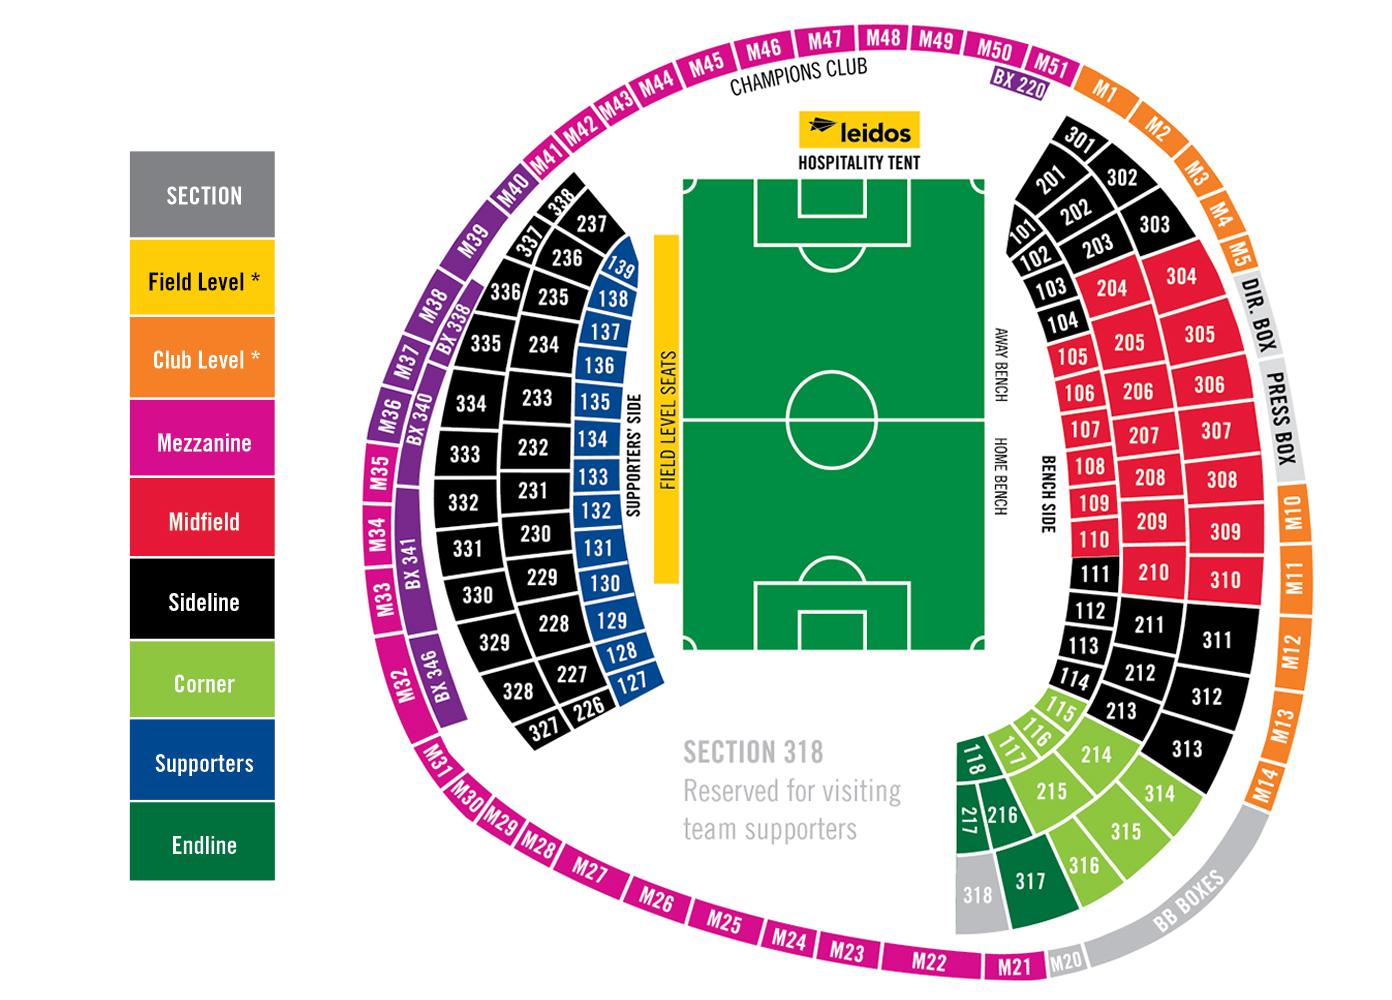 Rfk stadium washington dc tickets schedule seating charts